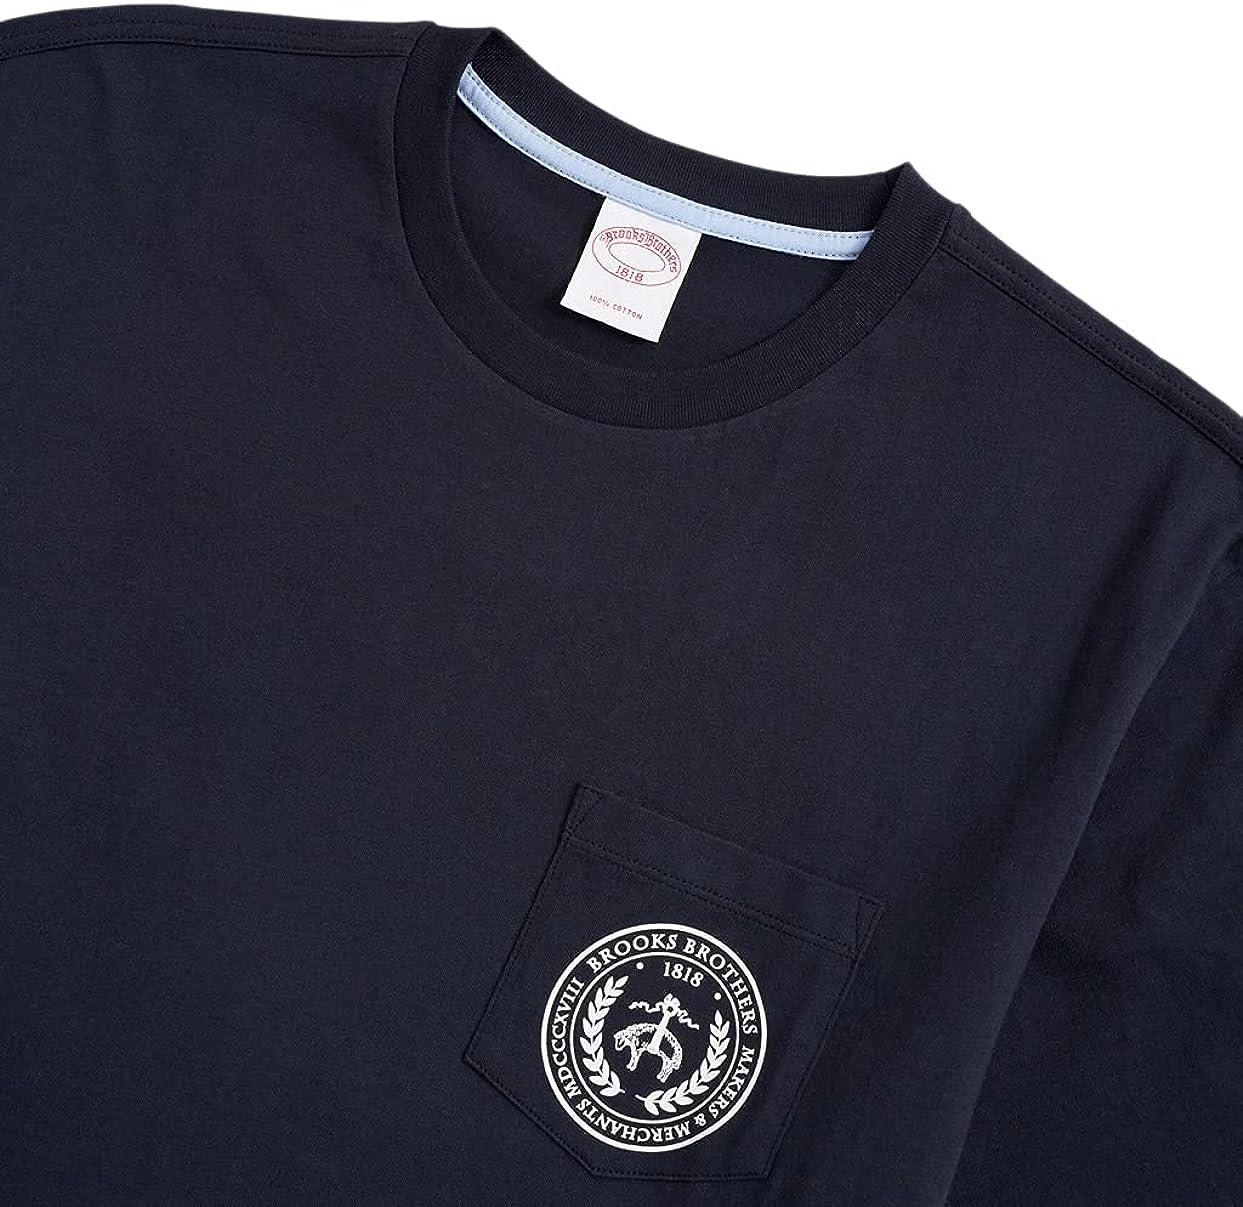 Brooks Brothers Men's Makers Merchants Crest Graphic Pocket Short Sleeve Tee T-Shirt